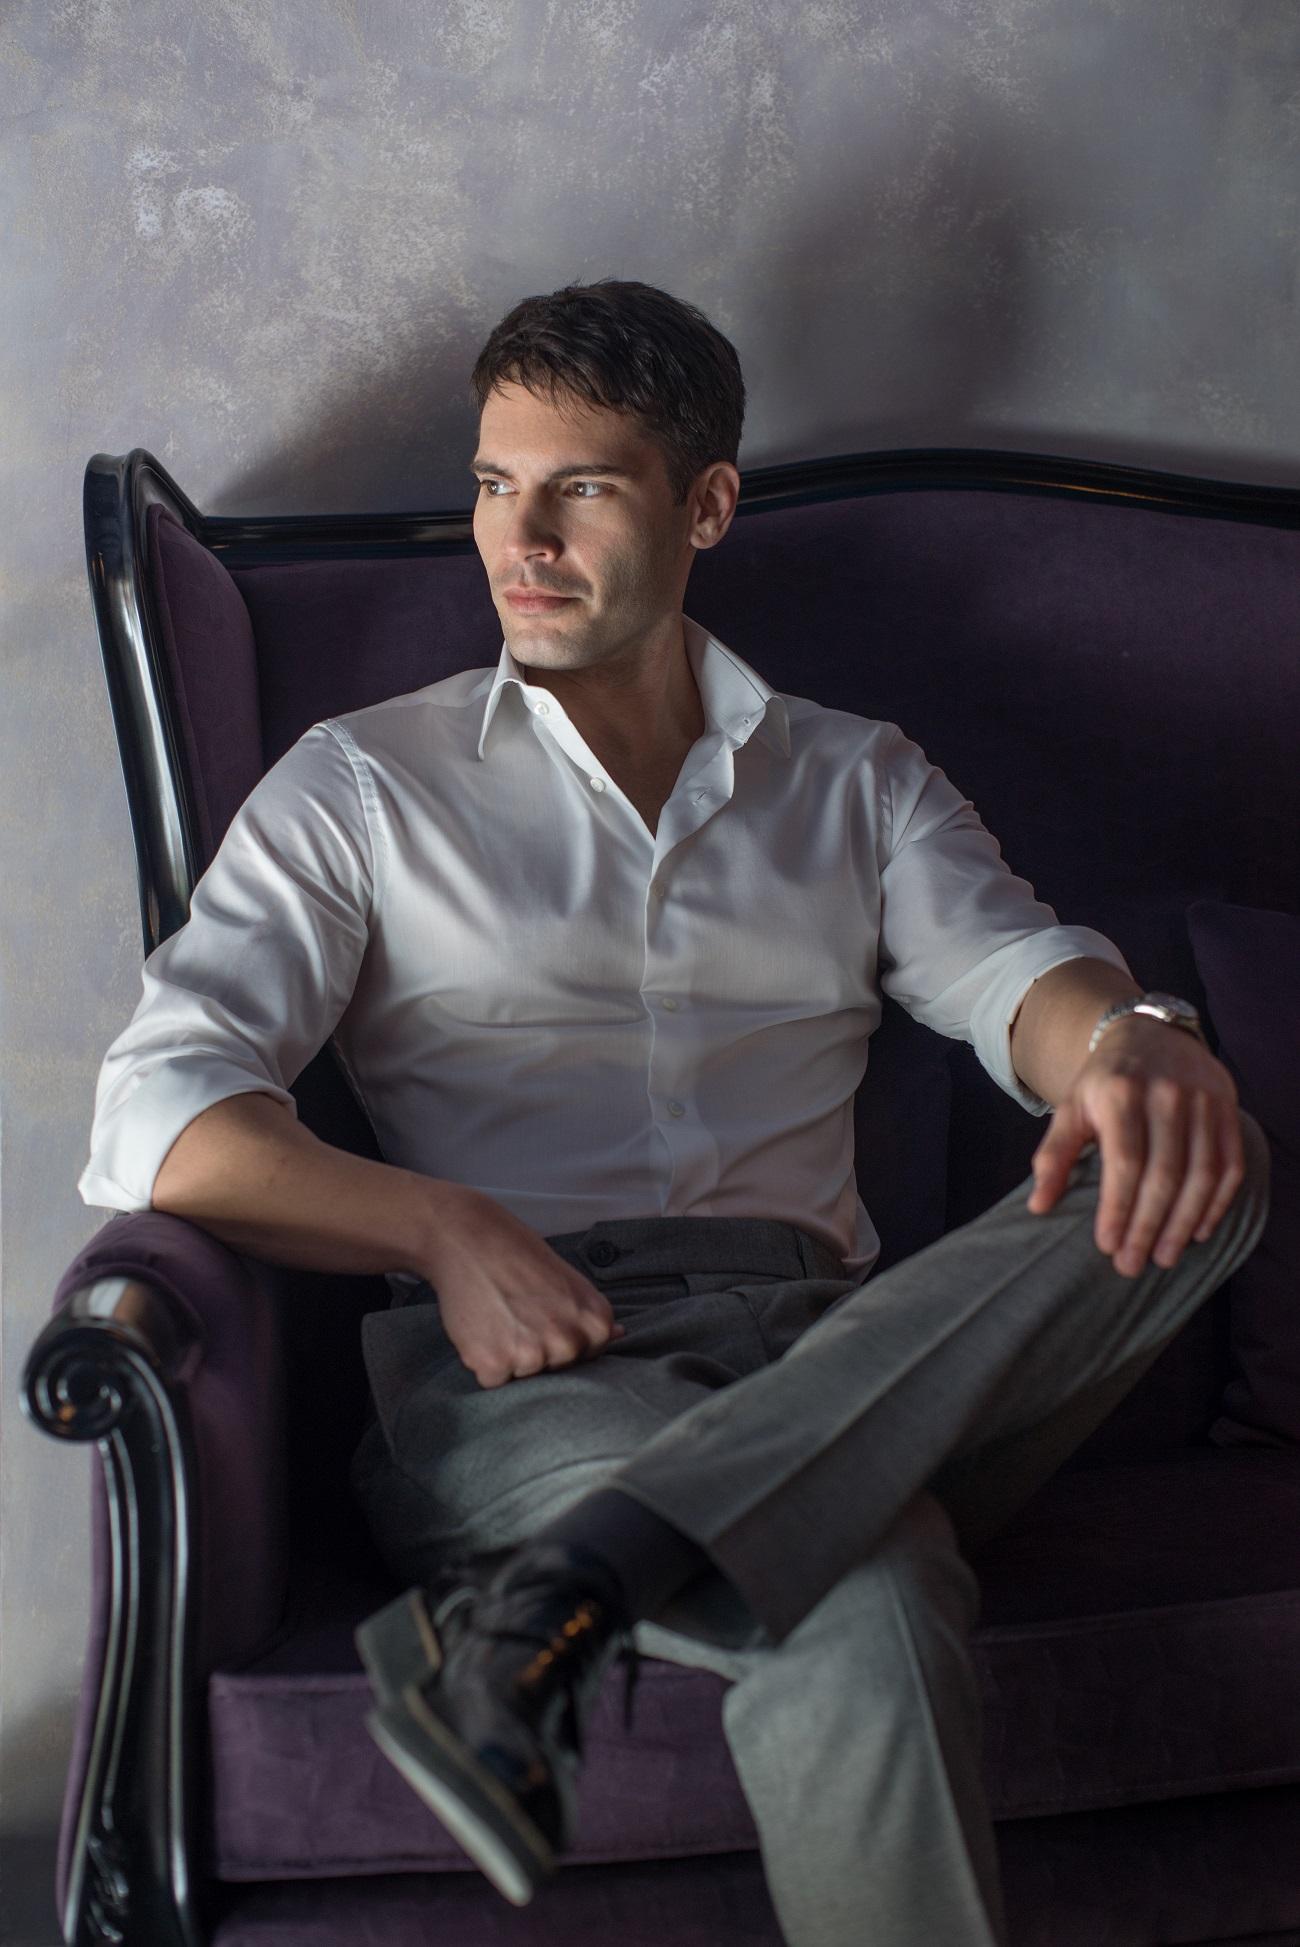 Vukota_Brajovic_wearing_Valter_by_Brana Peric_Jack_Sena1